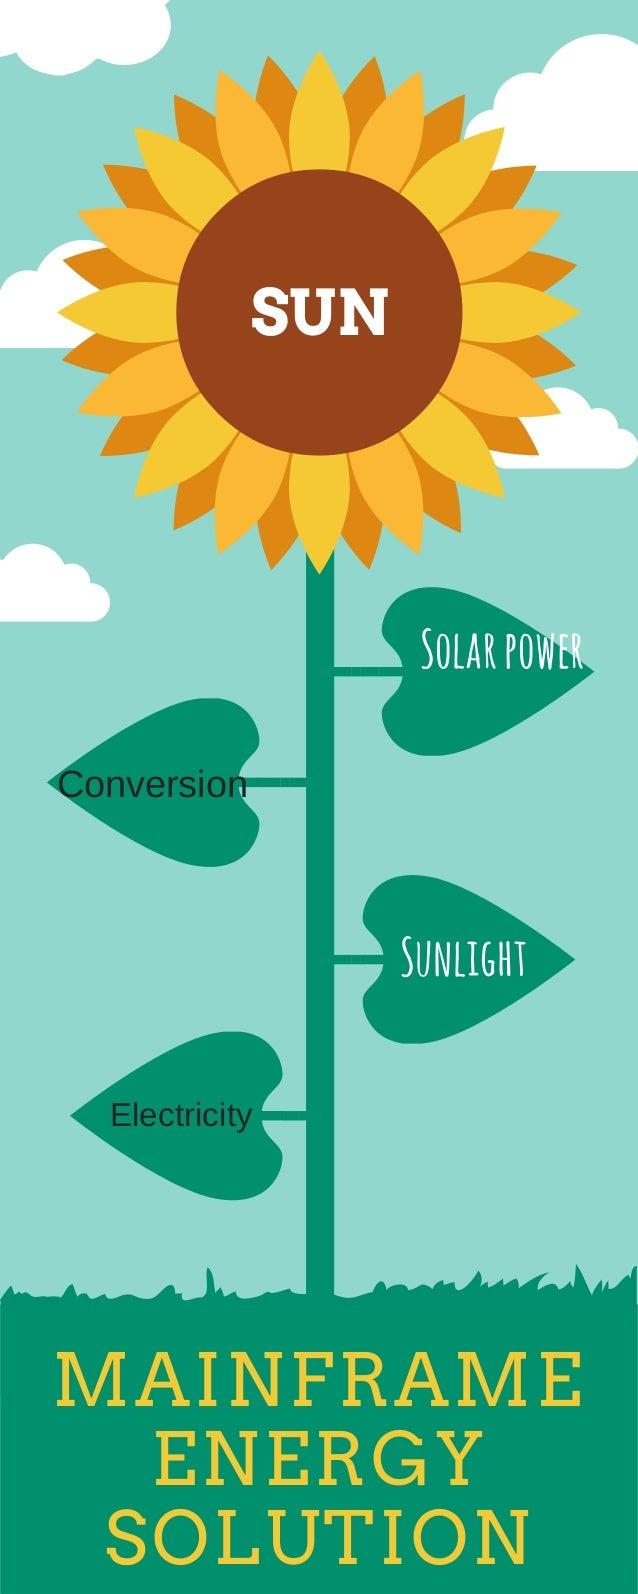 MAINFRAME ENERGY SOLUTION Sunlight SUN Solarpower Conversion Electricity